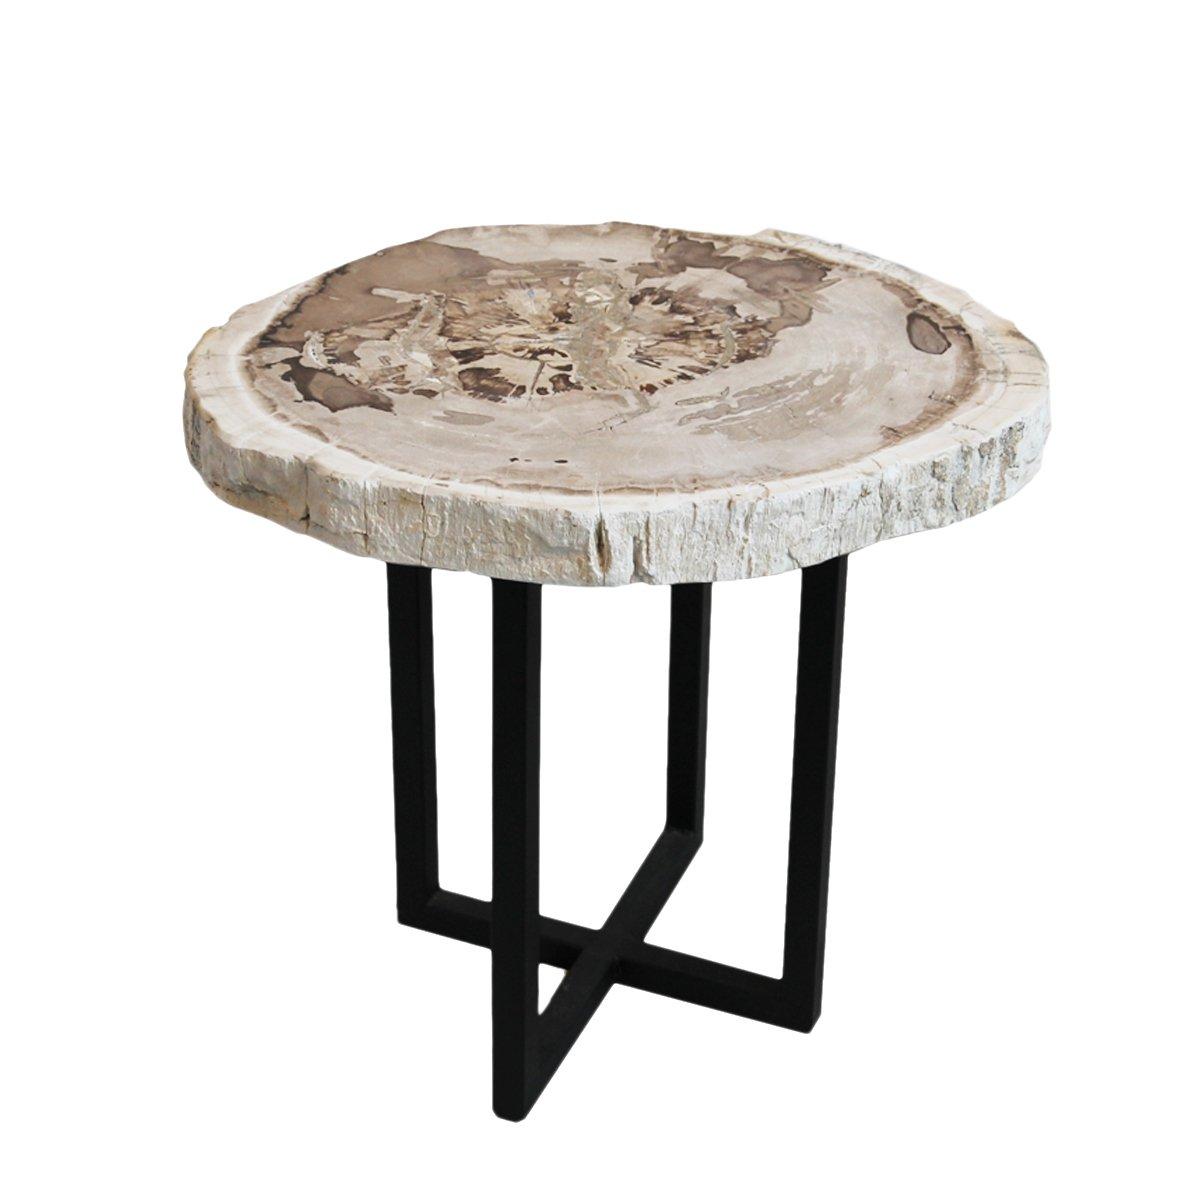 Wood Slice Coffee Table.Amazon Com Mix Furniture Petrified Wood Slice Side Table Home